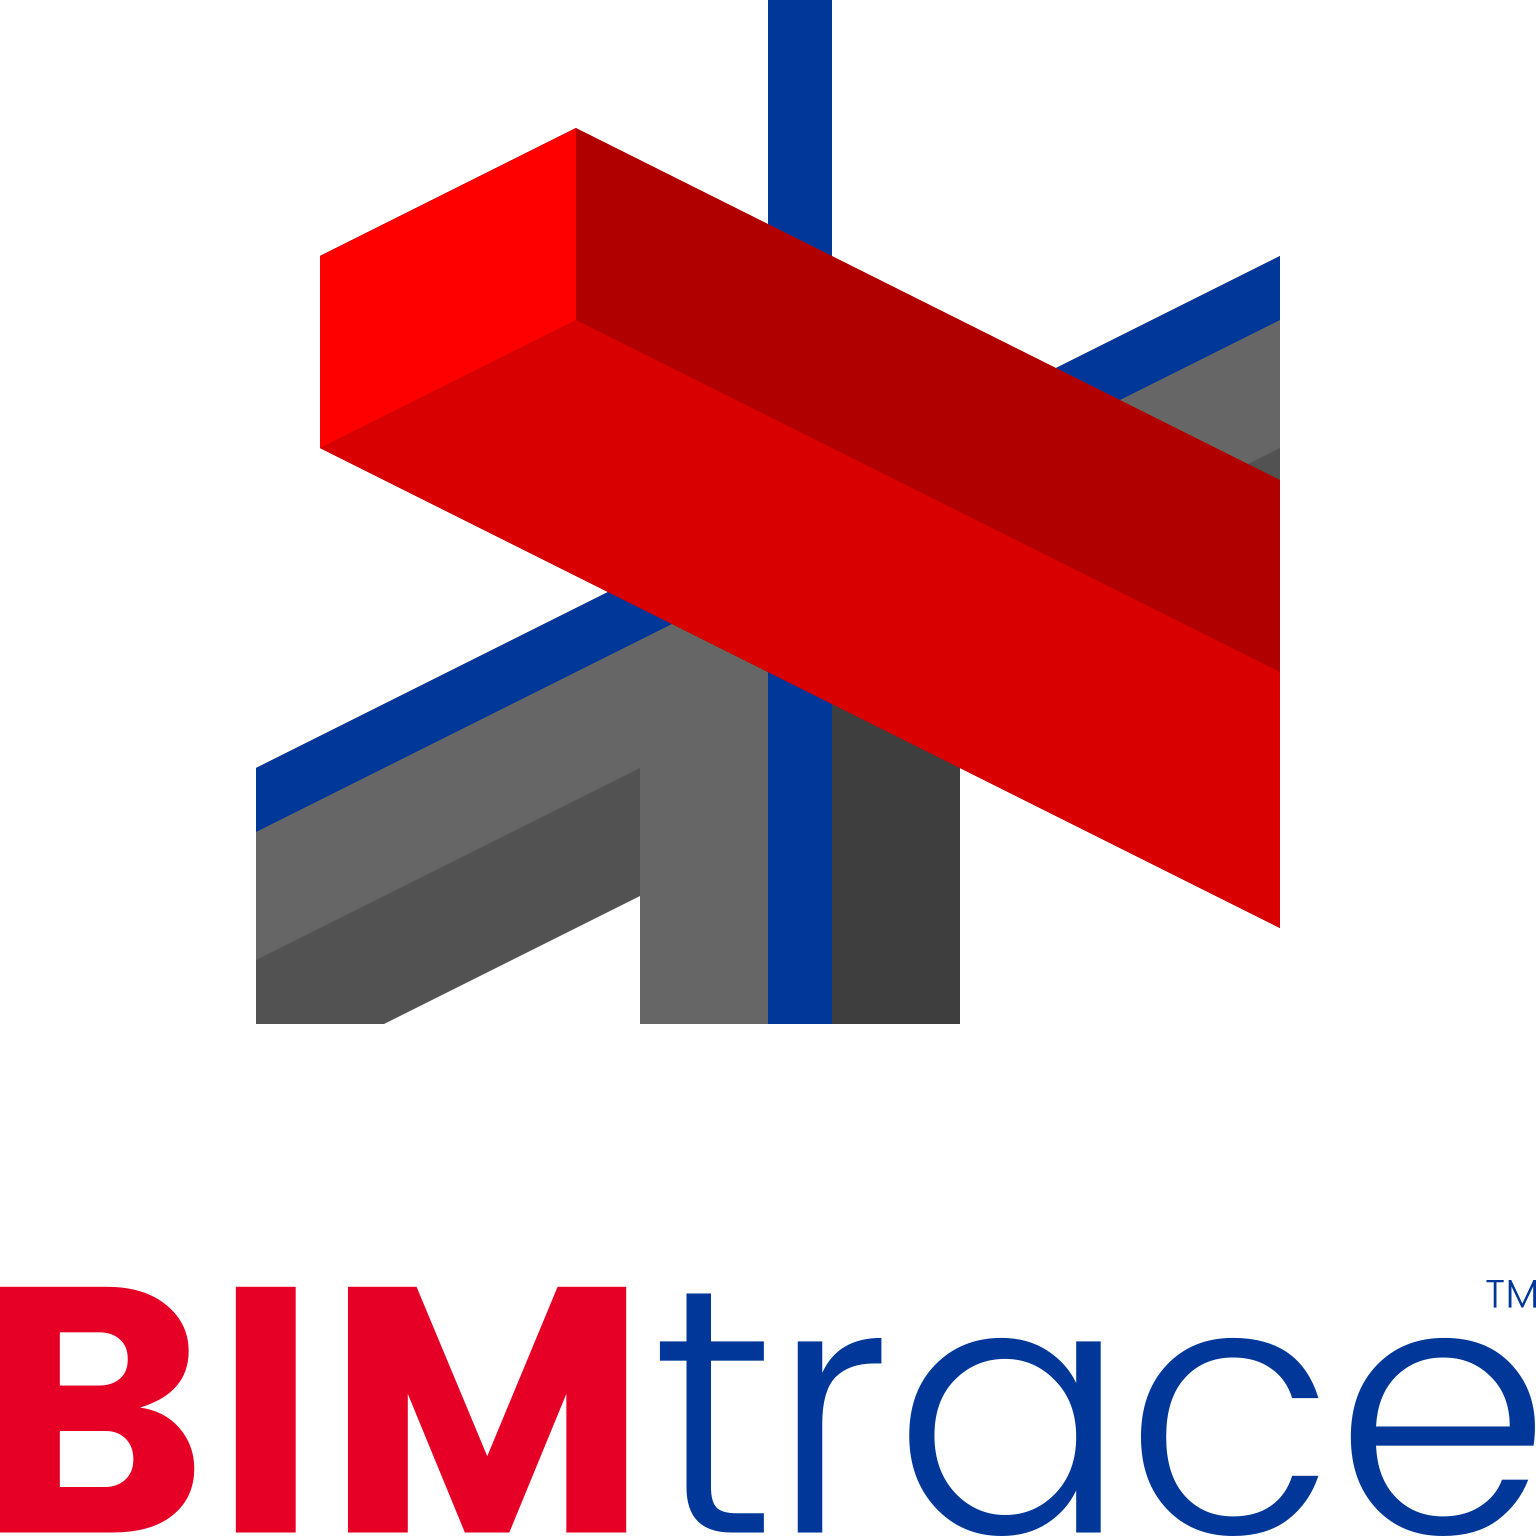 Bimtrace logo